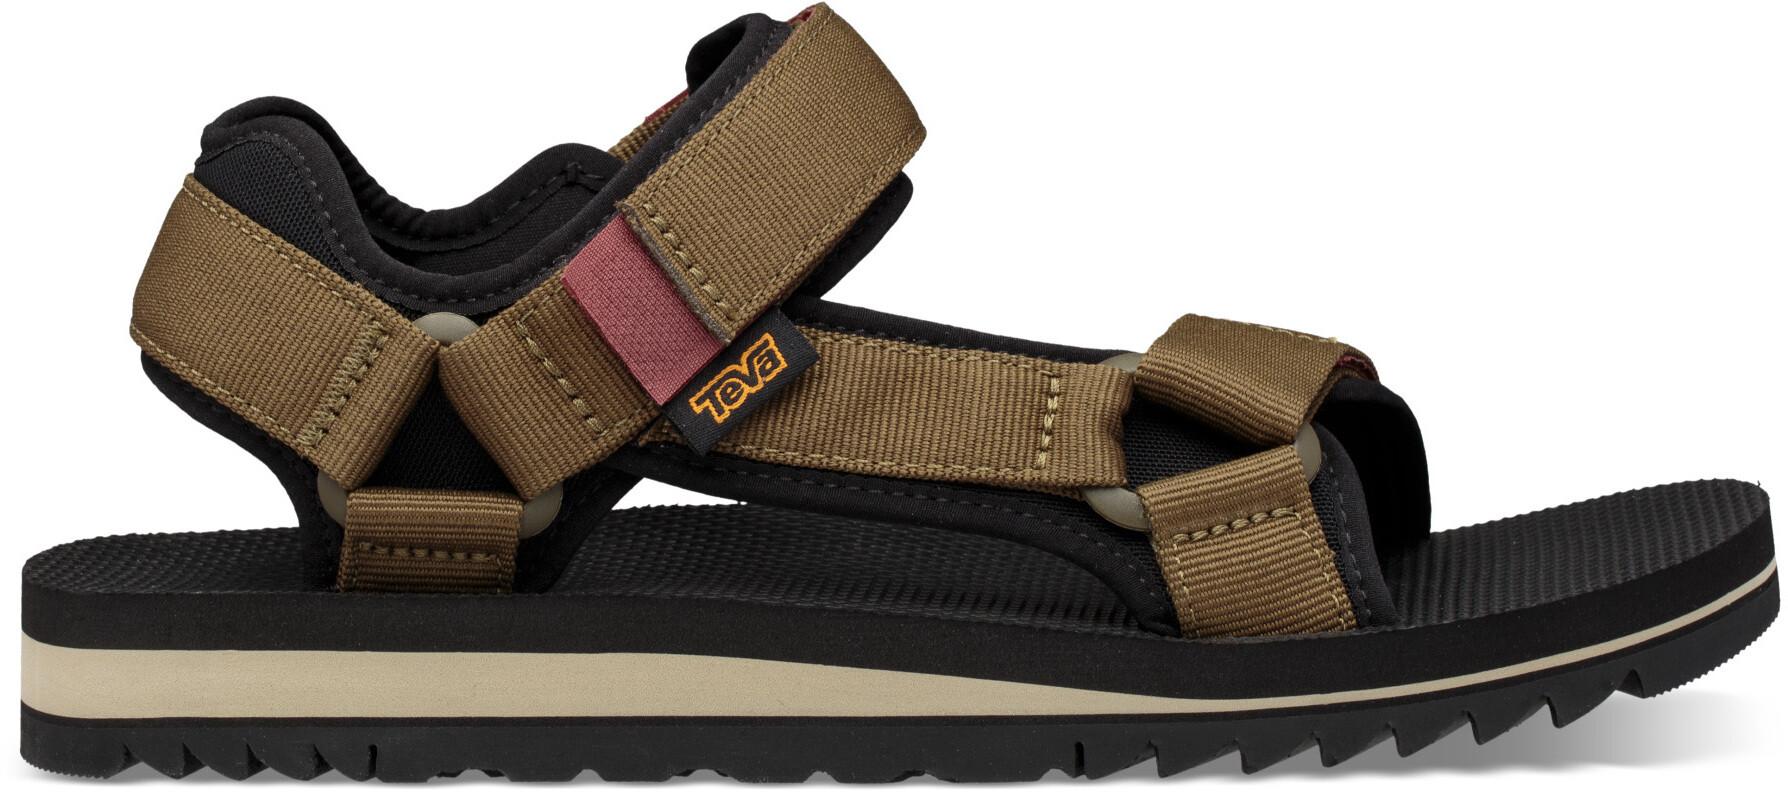 Teva Schuhe & Sandalen günstig | Teva Shop bei